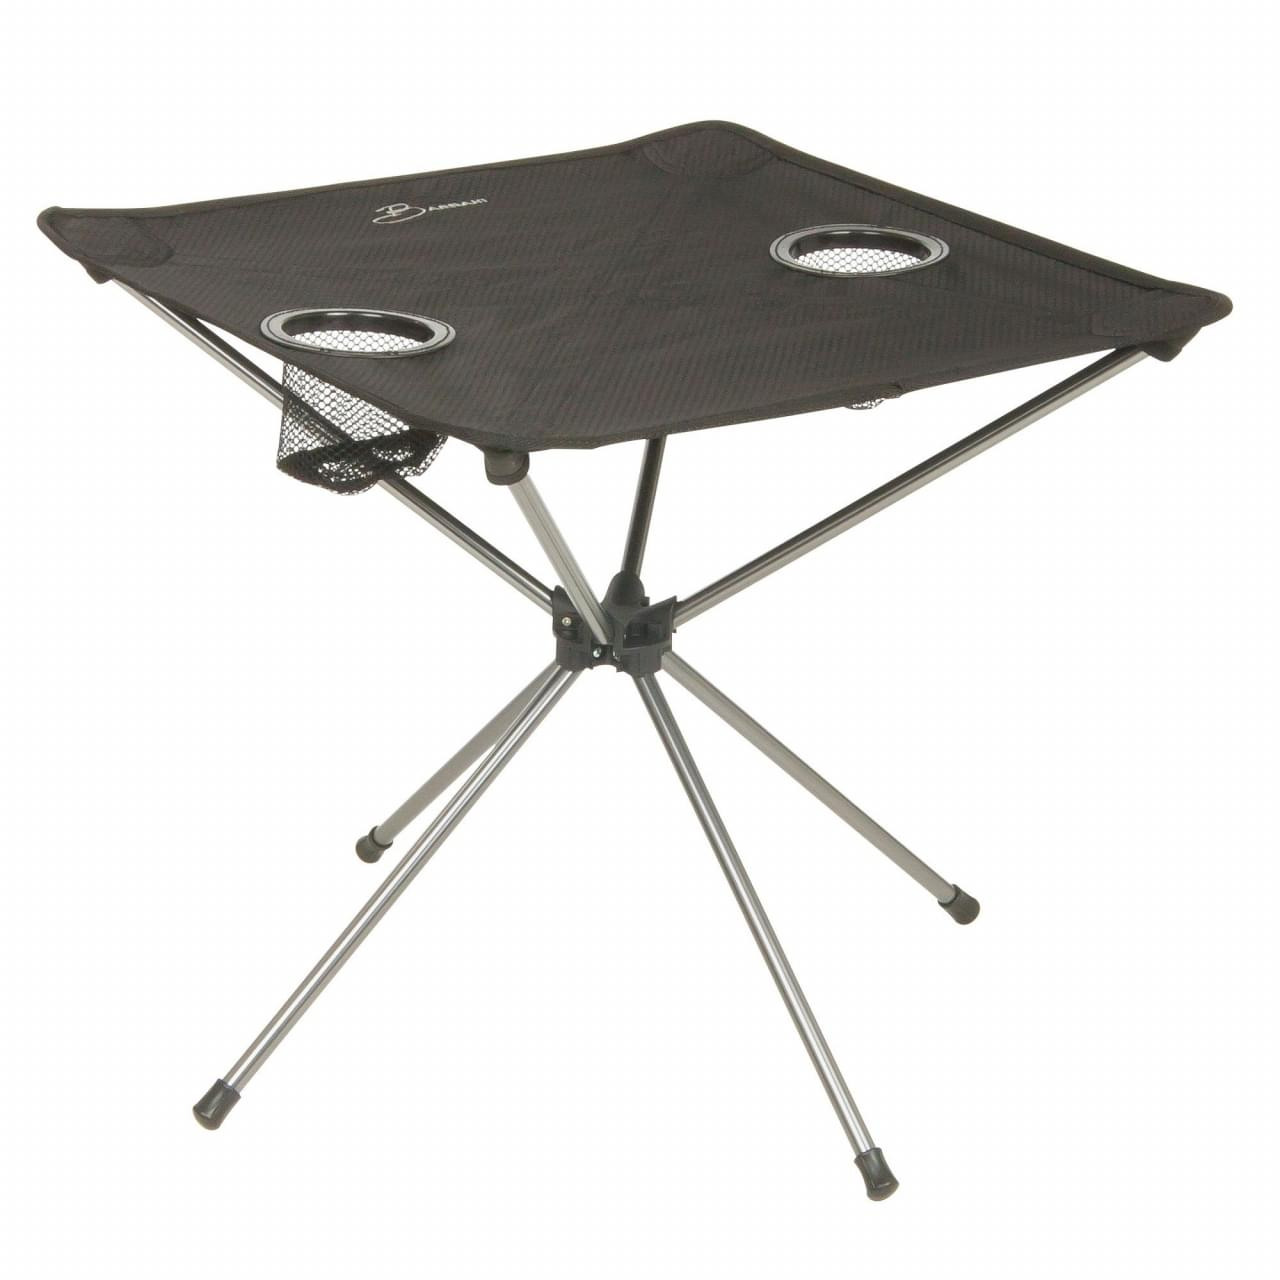 Bardani Colibri 38 x 38 cm Lichtgewicht Campingtafel